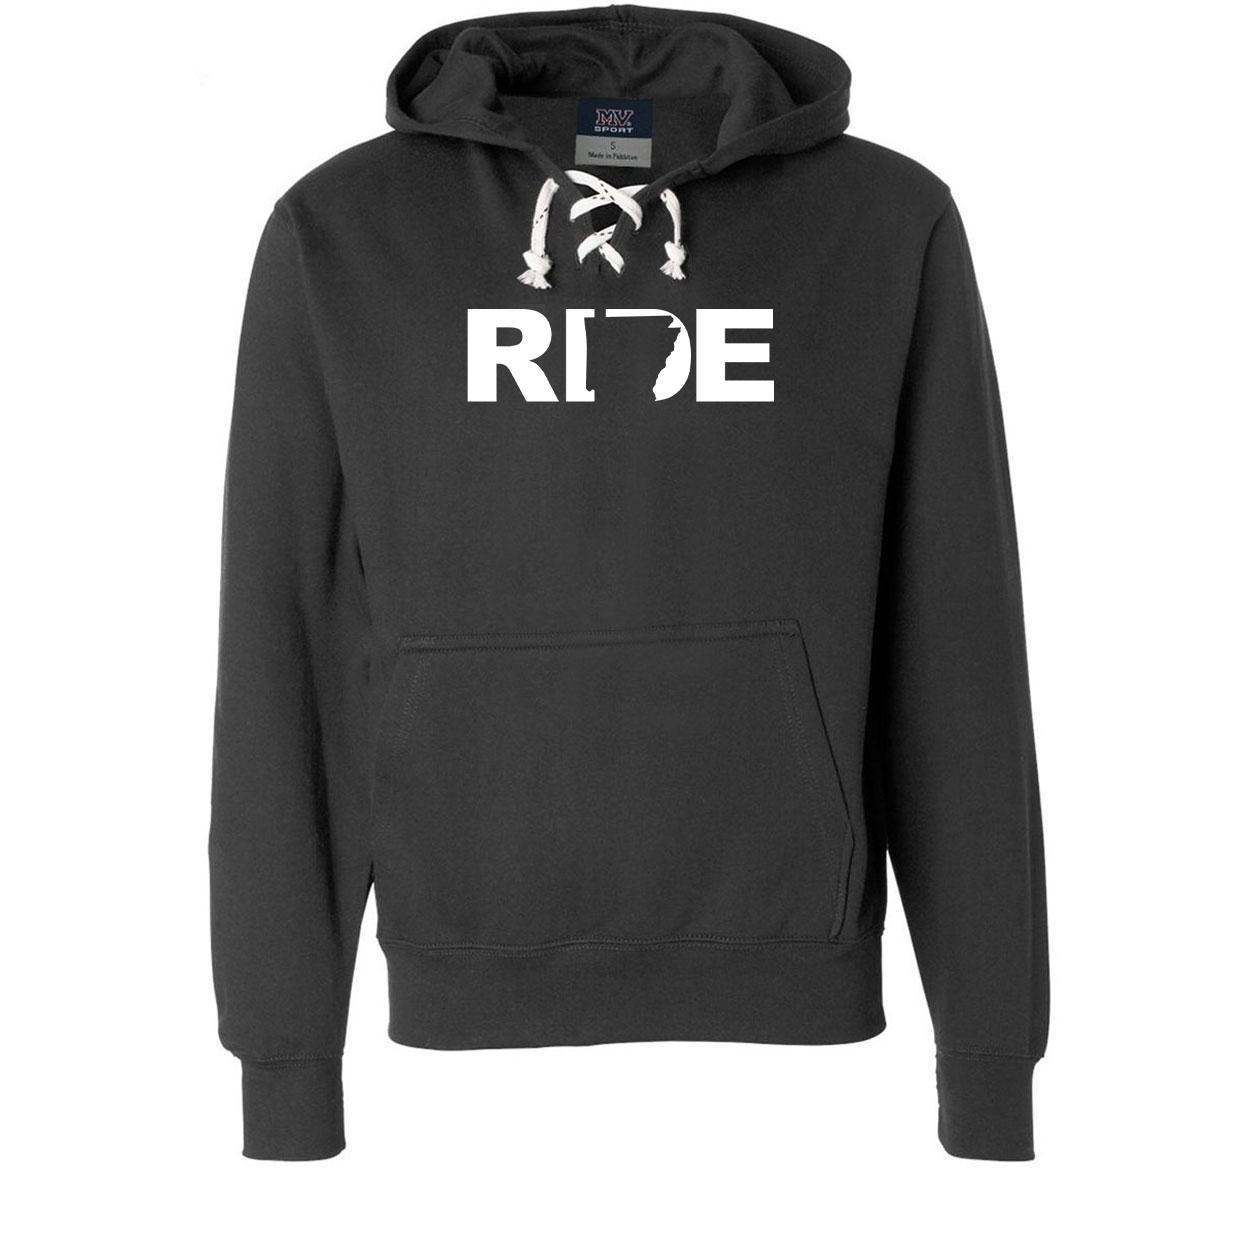 Ride Arkansas Classic Unisex Premium Hockey Sweatshirt Black (White Logo)